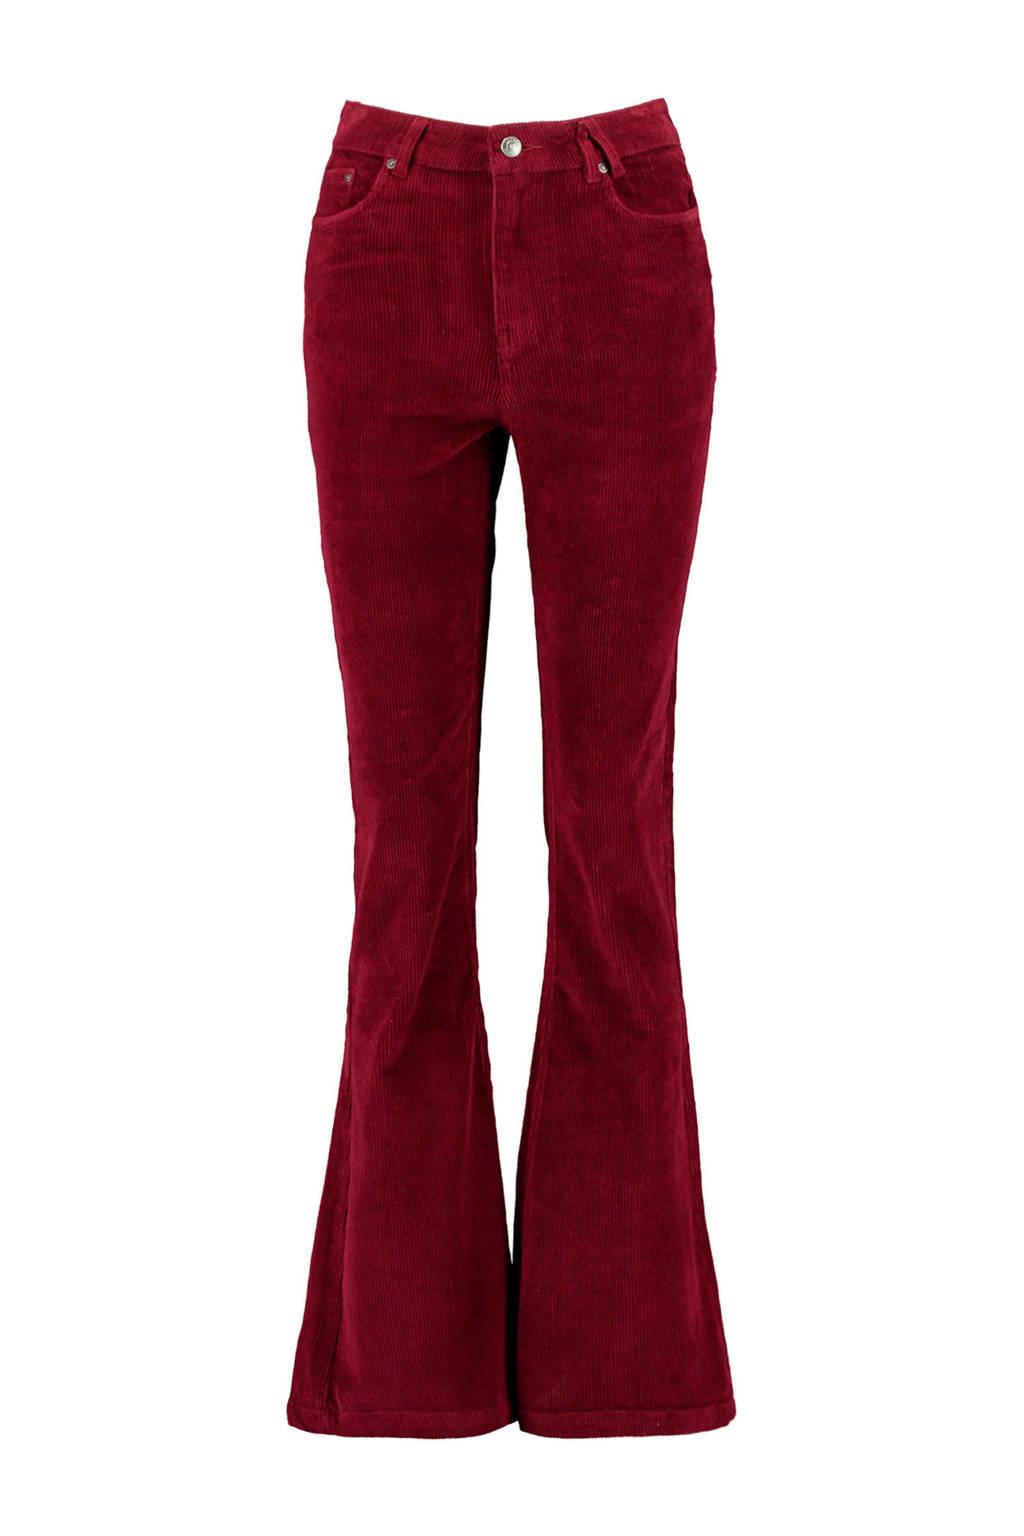 America Today corduroy high waist flared broek rood, Rood